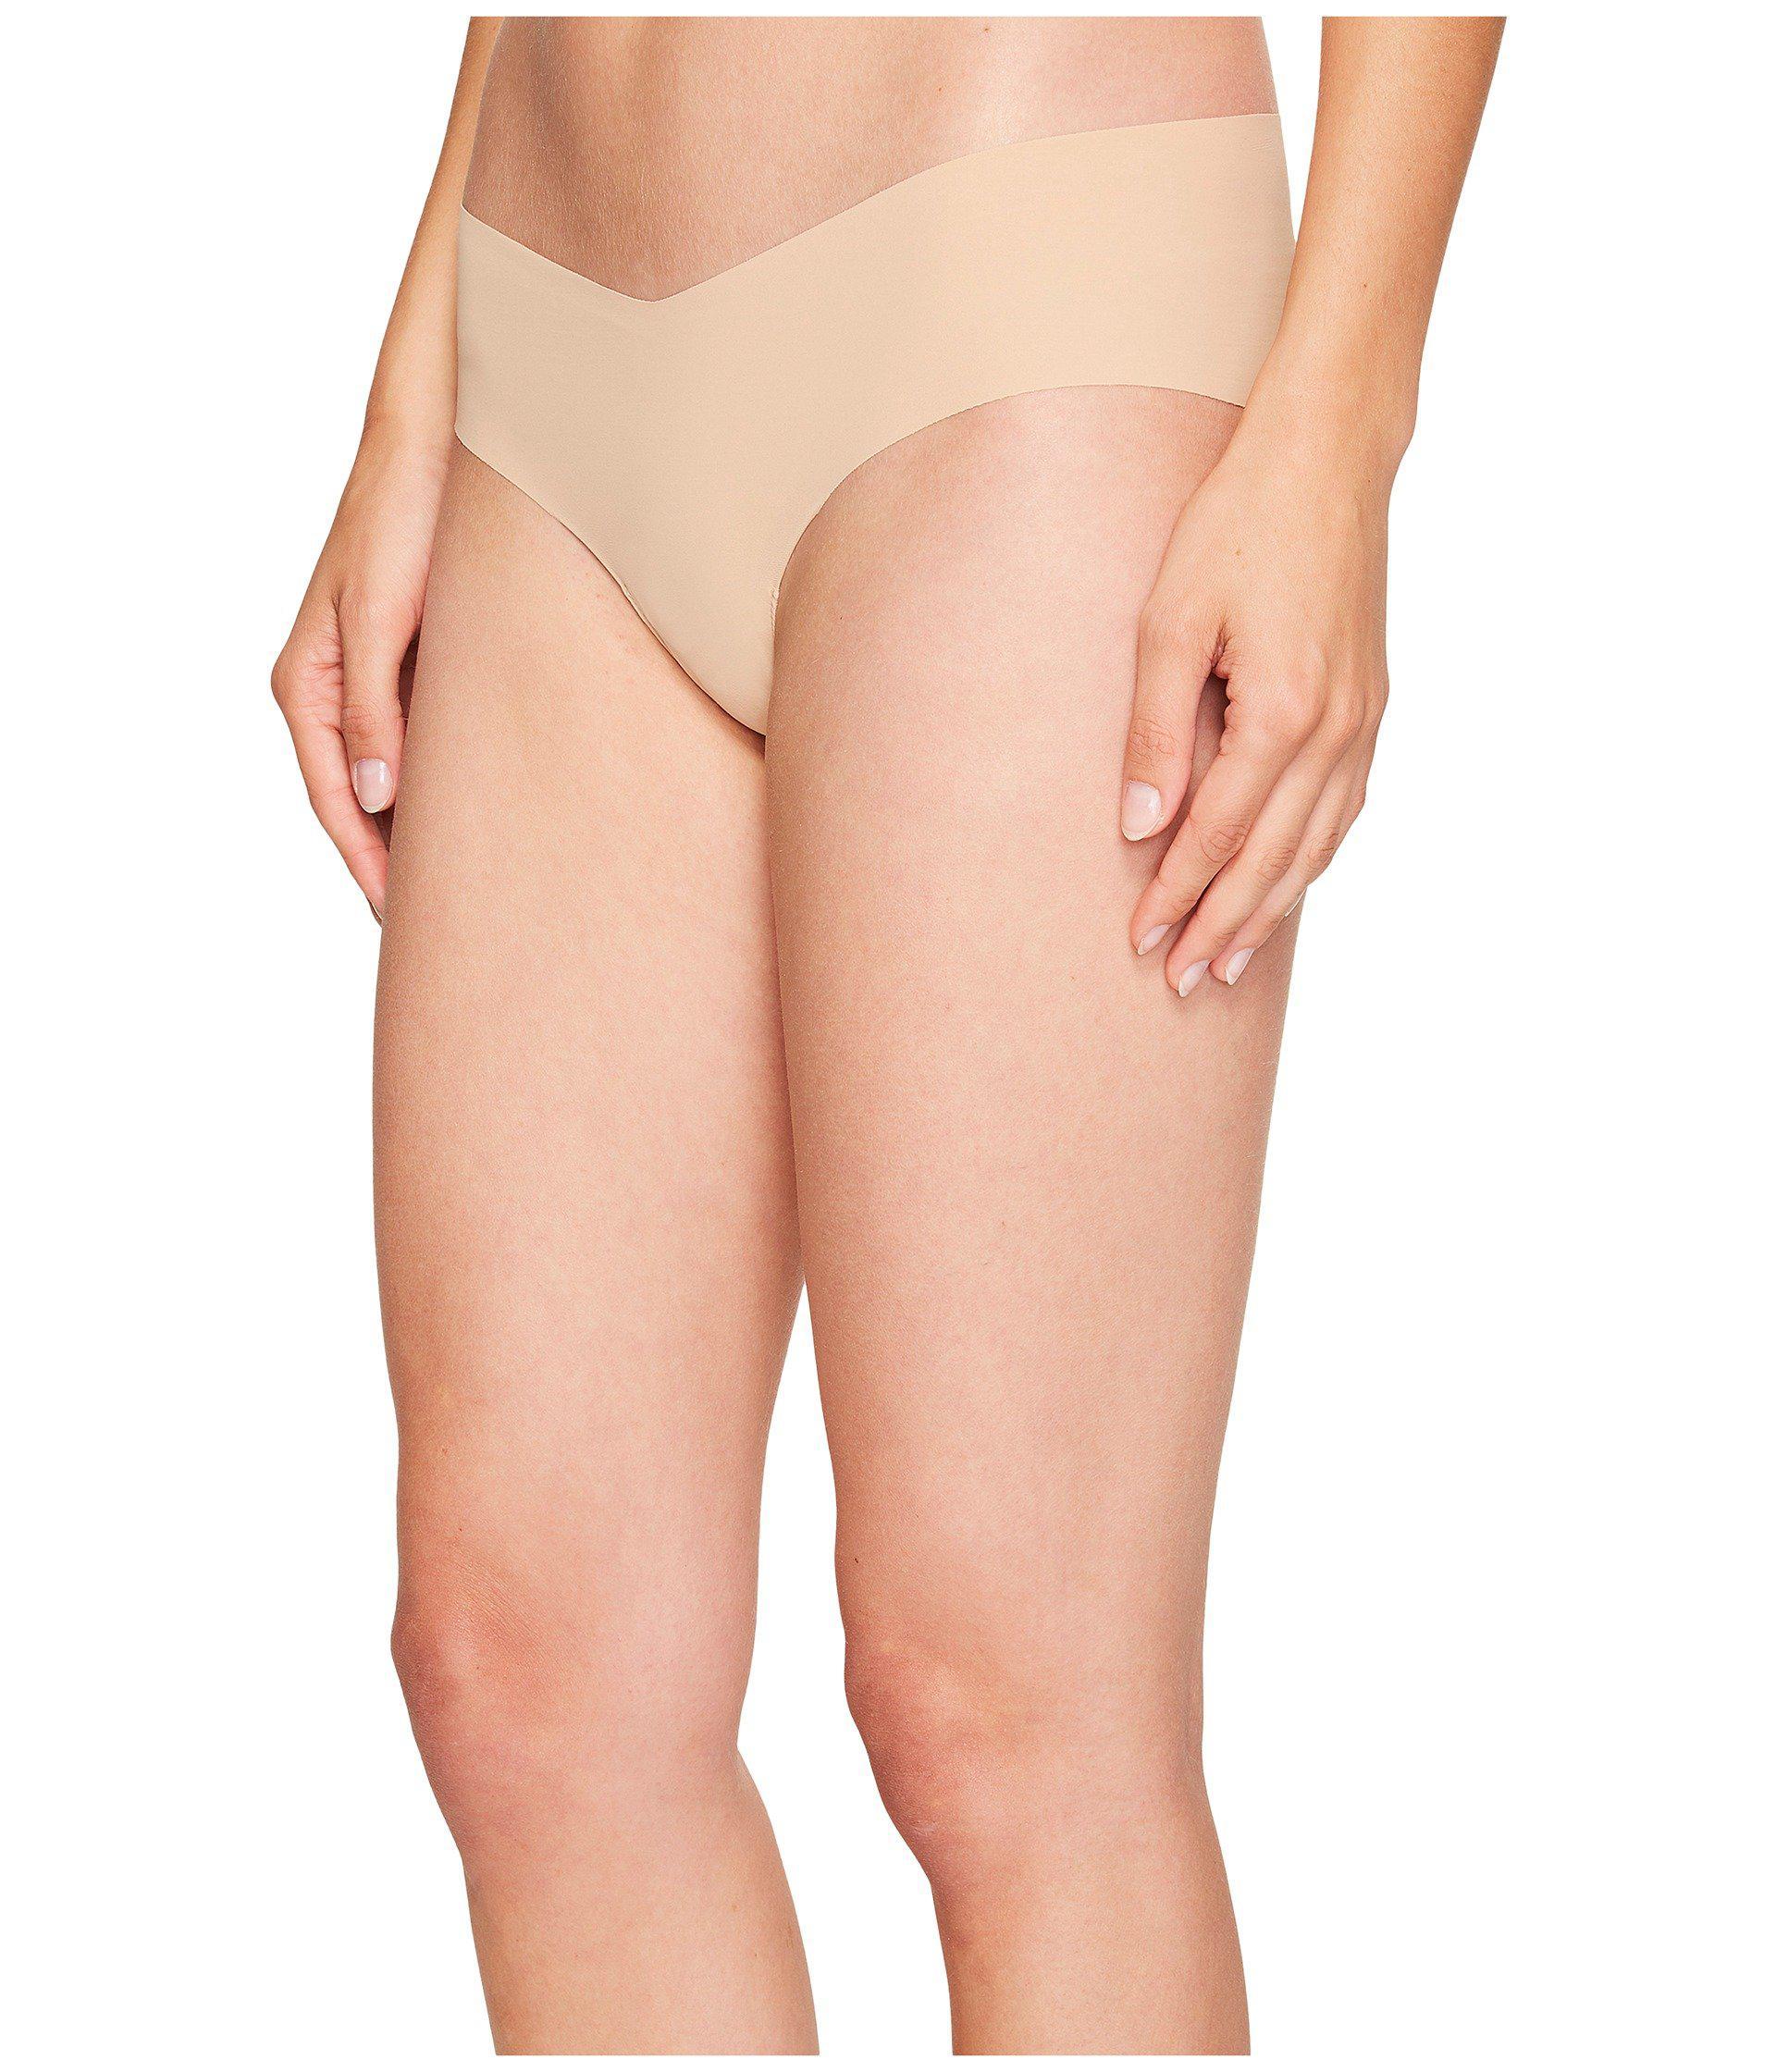 c699f5fde0c1 Lyst - Commando Solid Girl Short Gs01 (black) Women's Underwear in Natural